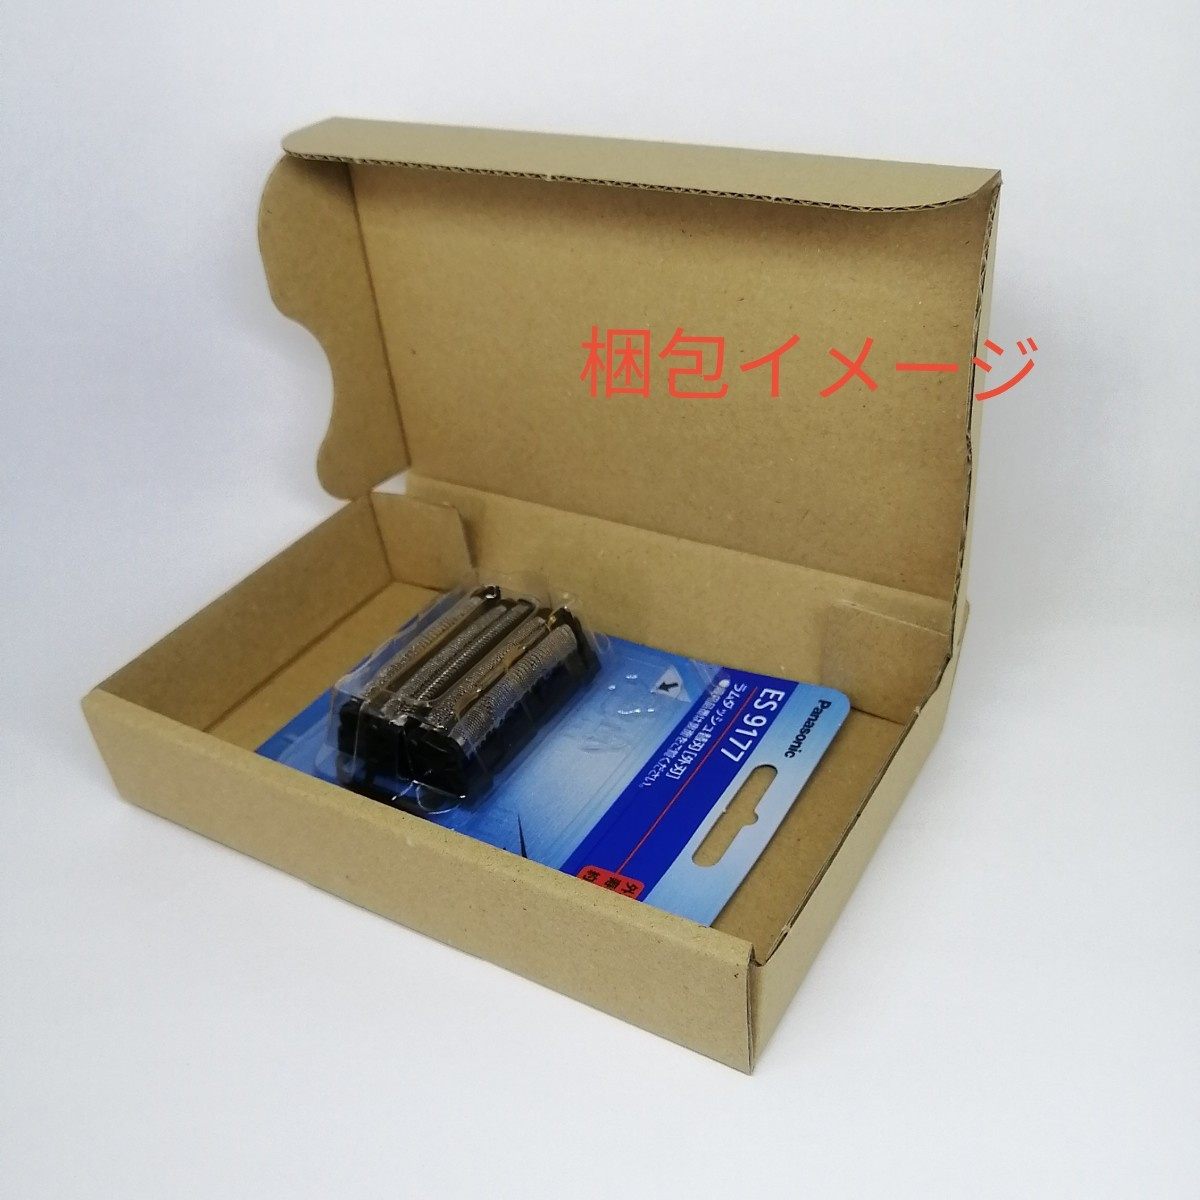 ES9177 シェーバー 替刃 パナソニック正規品★安心!箱で梱包★Panasonic